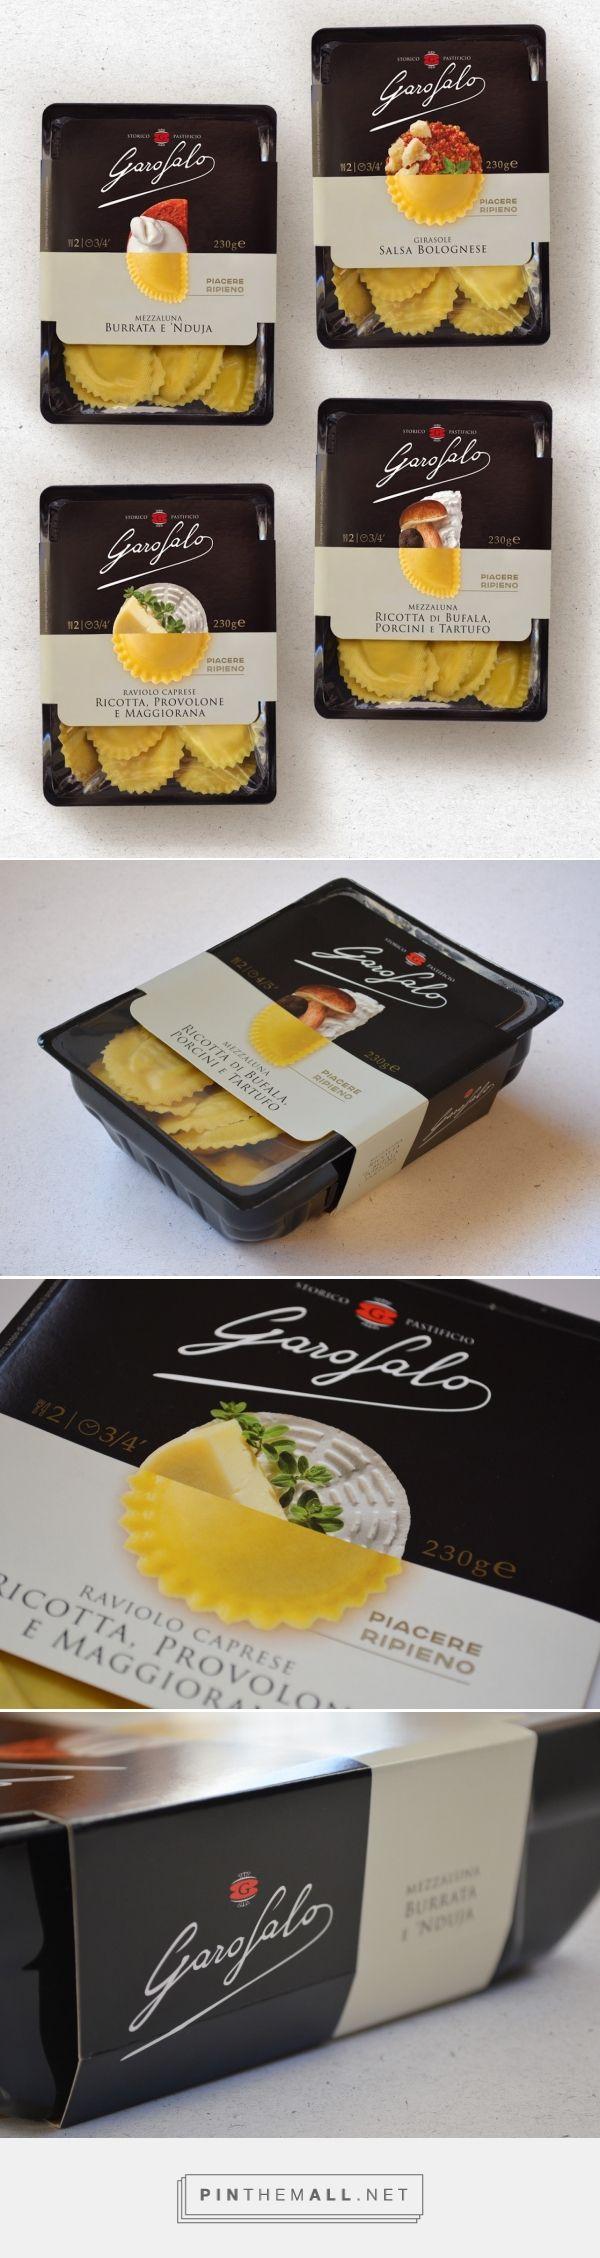 Garofalo Pasta Ripiena packaging design by Rossoamaranto - http://www.packagingoftheworld.com/2017/02/garofalo-pasta-ripiena.html